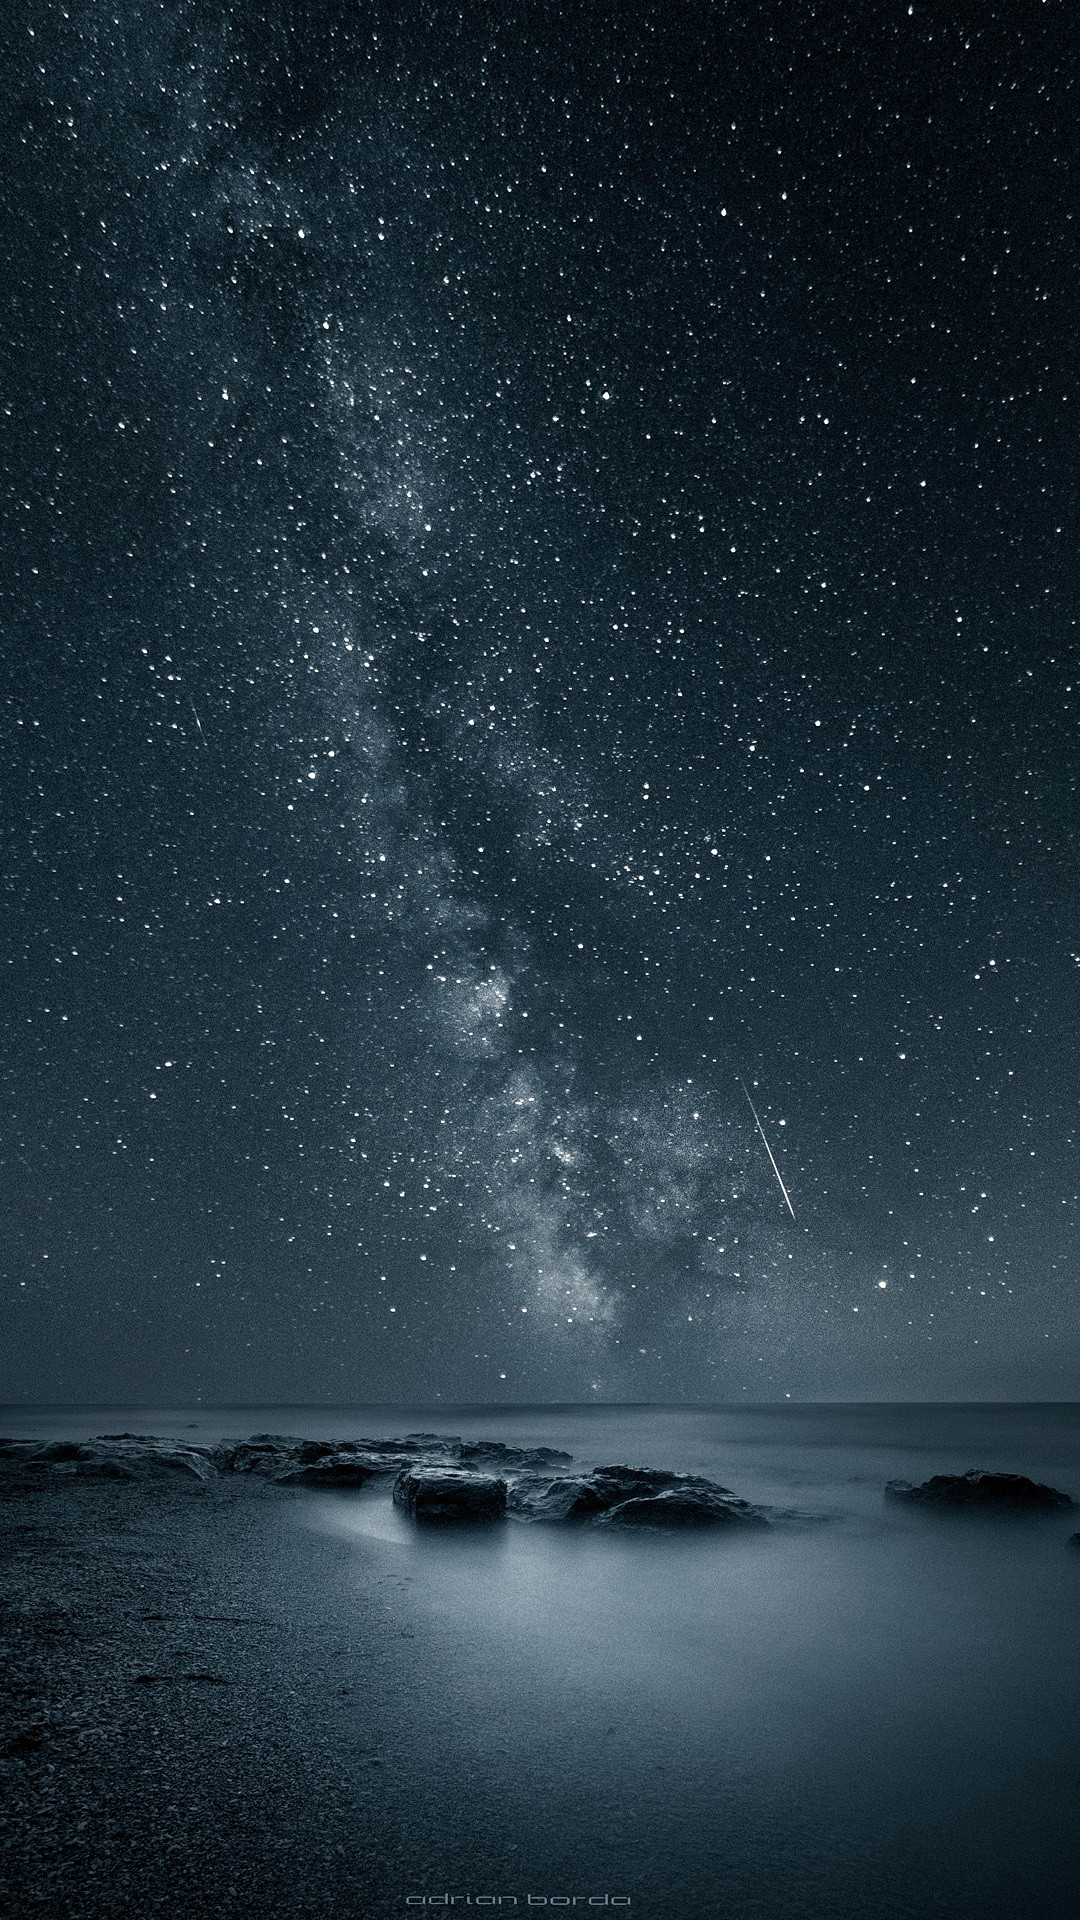 I See Stars Wallpaper 78 images